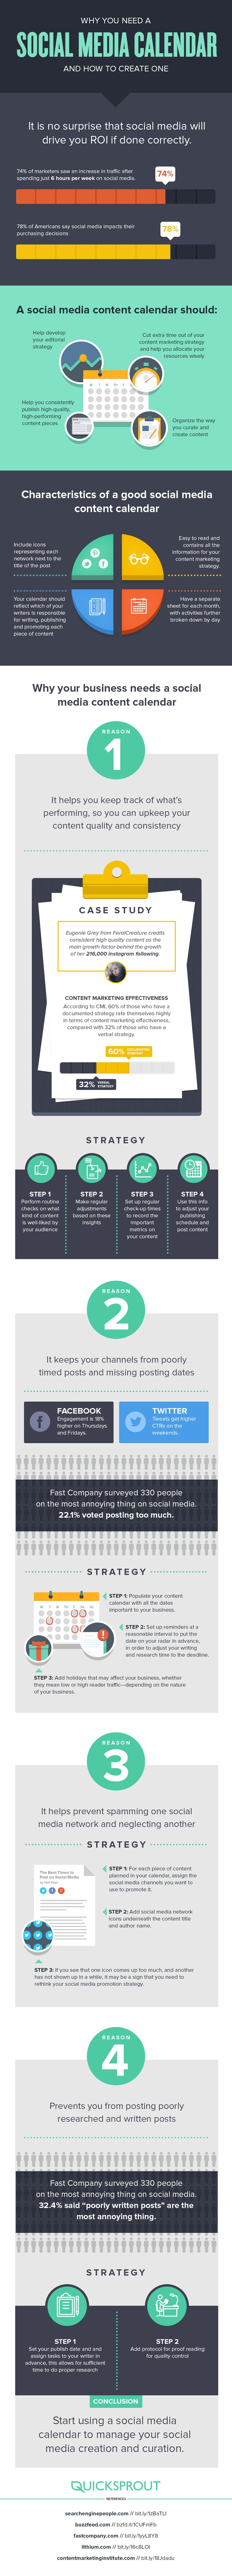 Social_Media_Calendar infographic